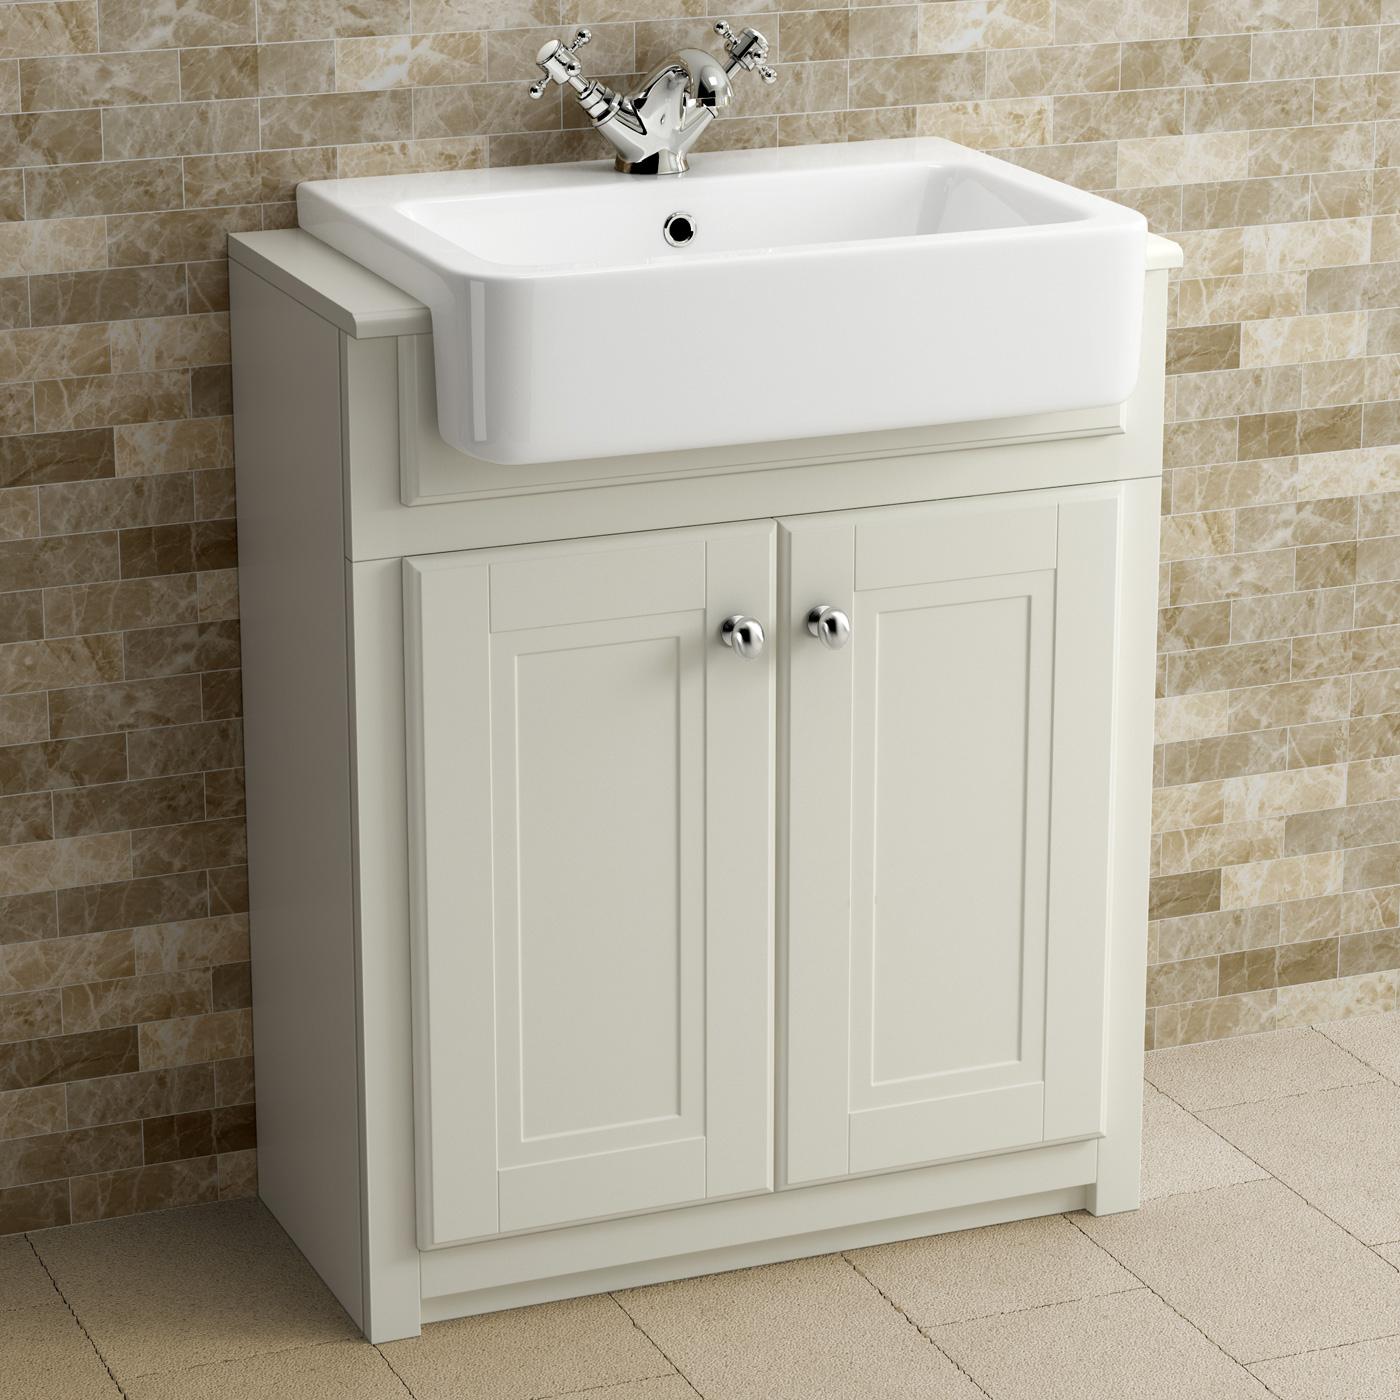 Clotted Cream Bathroom Vanity Unit Basin Furniture Storage with regard to sizing 1400 X 1400